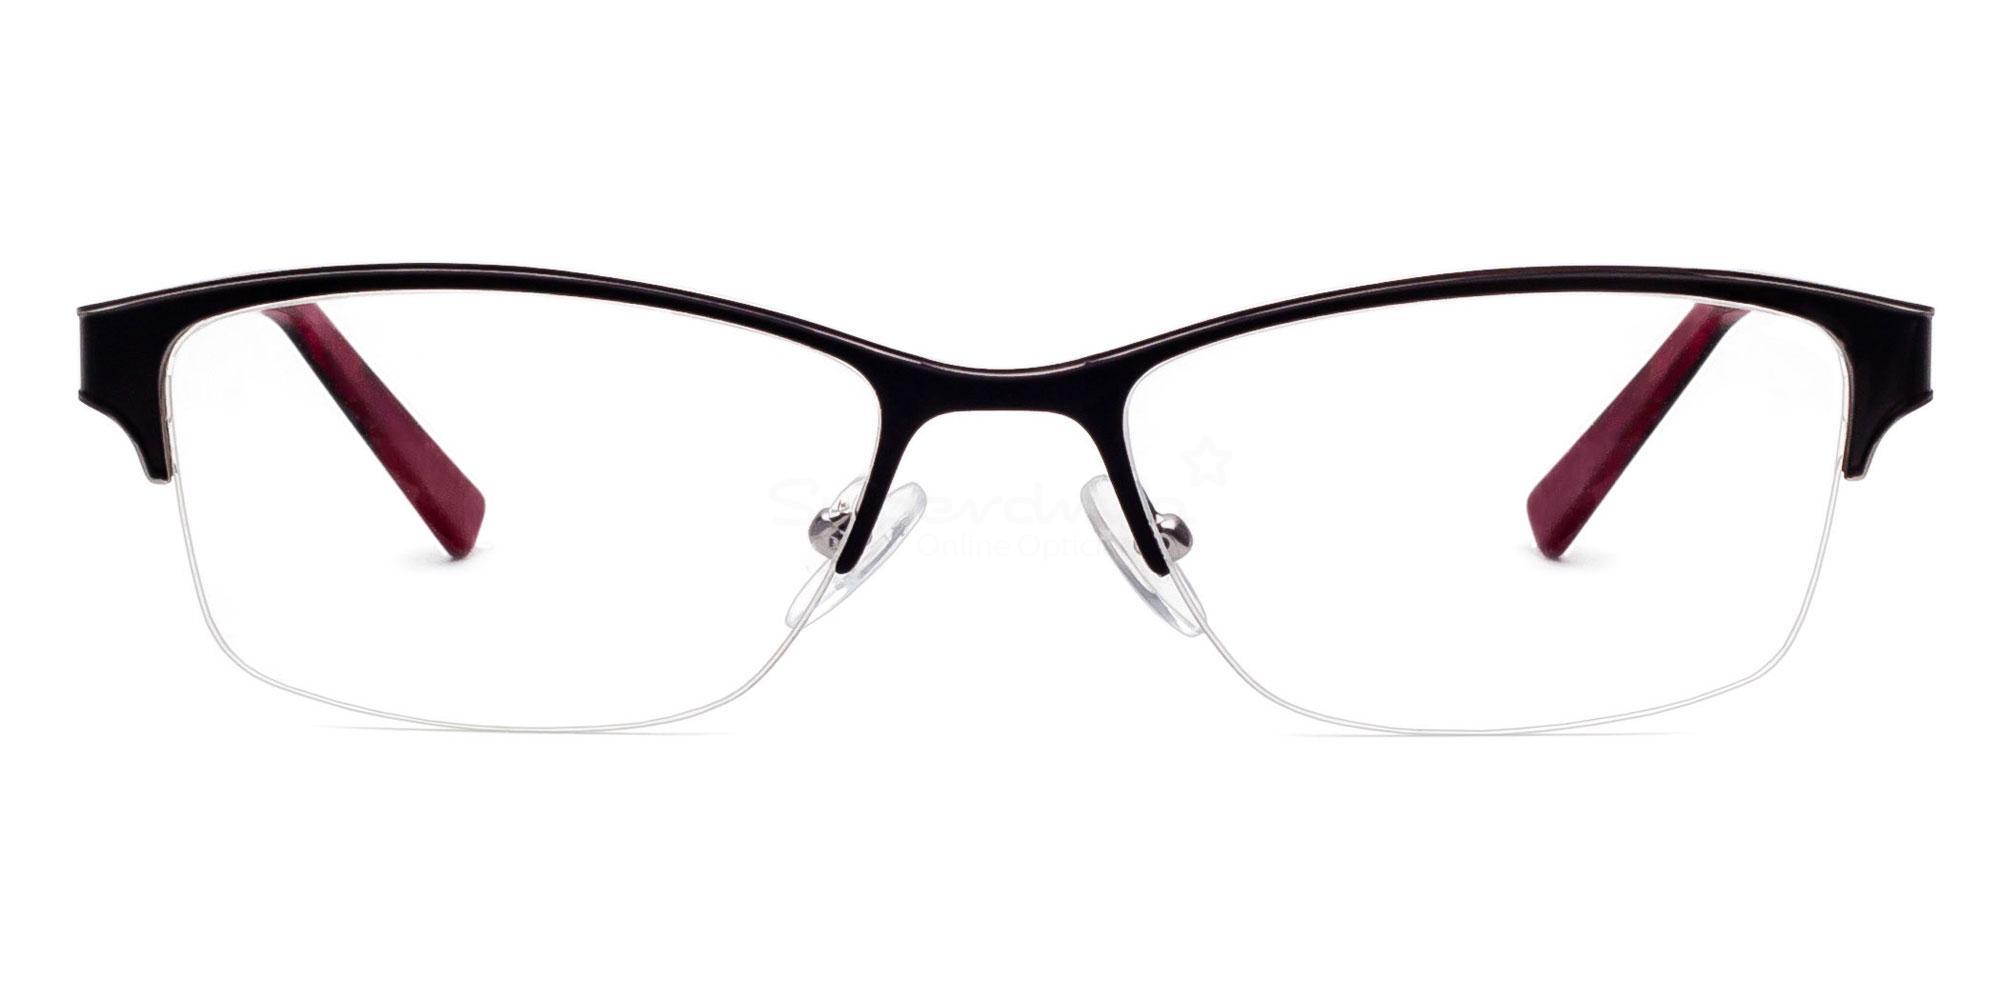 C1 9132 Glasses, Krypton